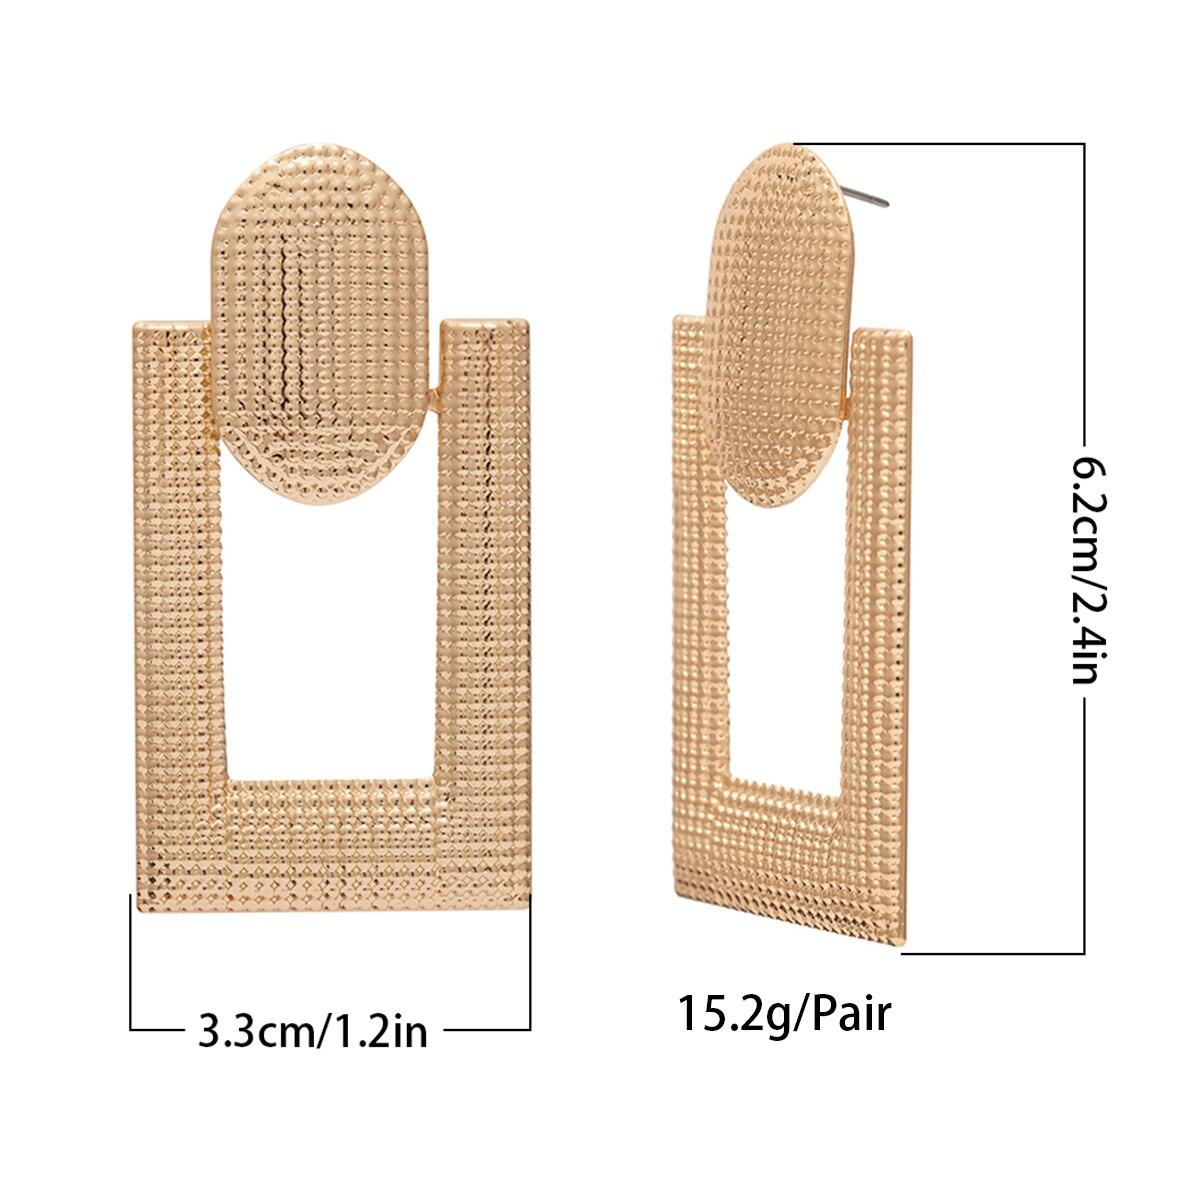 SHIXIN Big Drop Earrings for Women Geometry Statement Earrings 2019 Korean Fashion Jewelry Stylish Large Hanging Earings Female